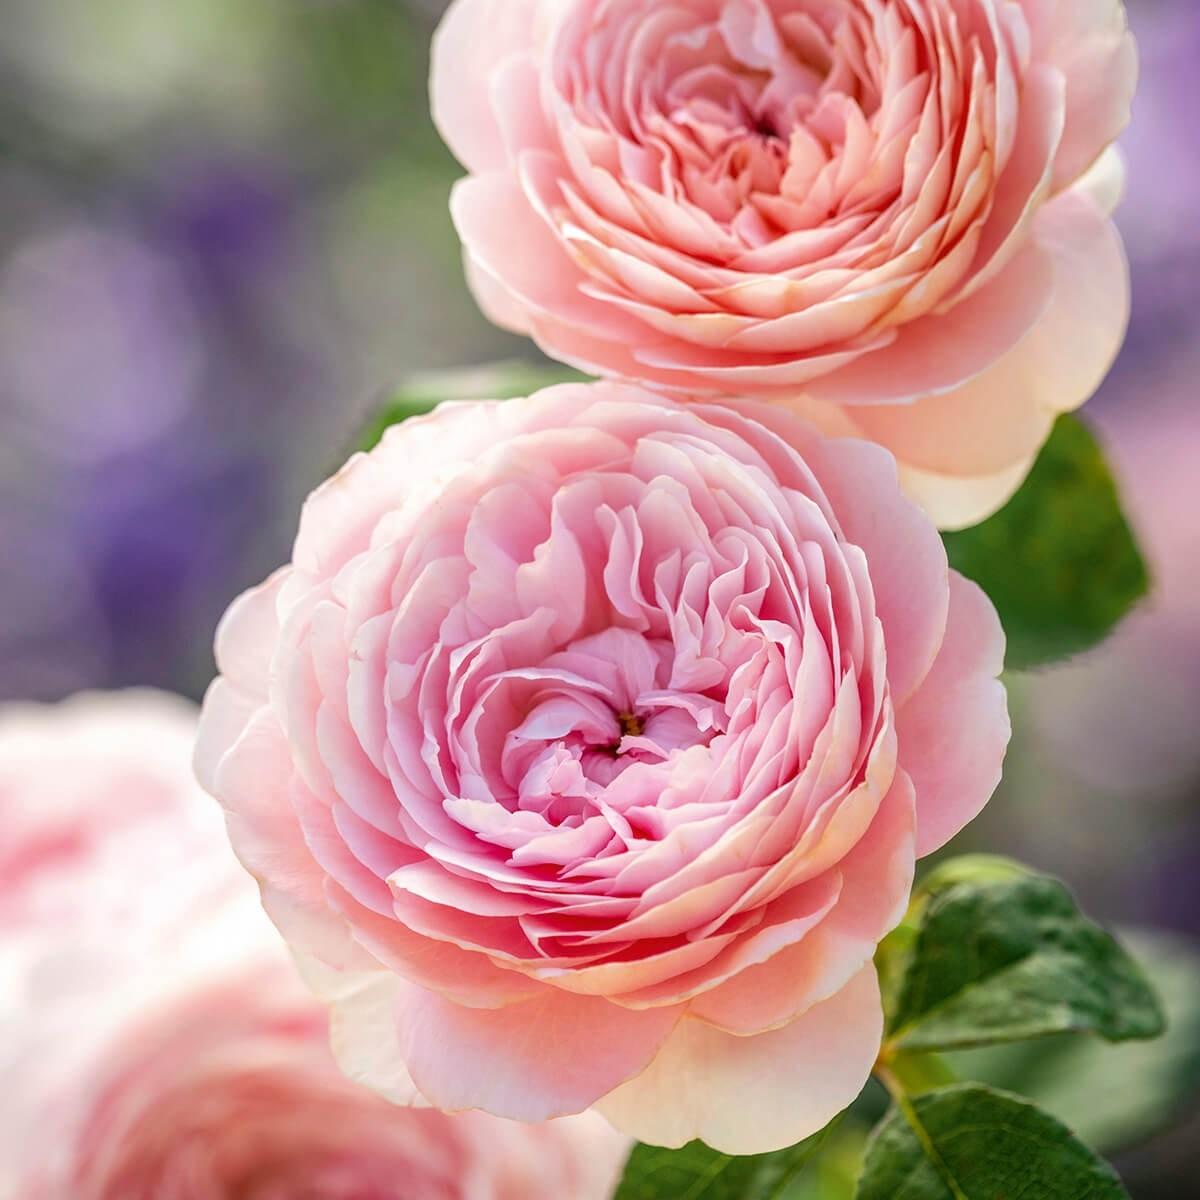 Beautiful Rose image